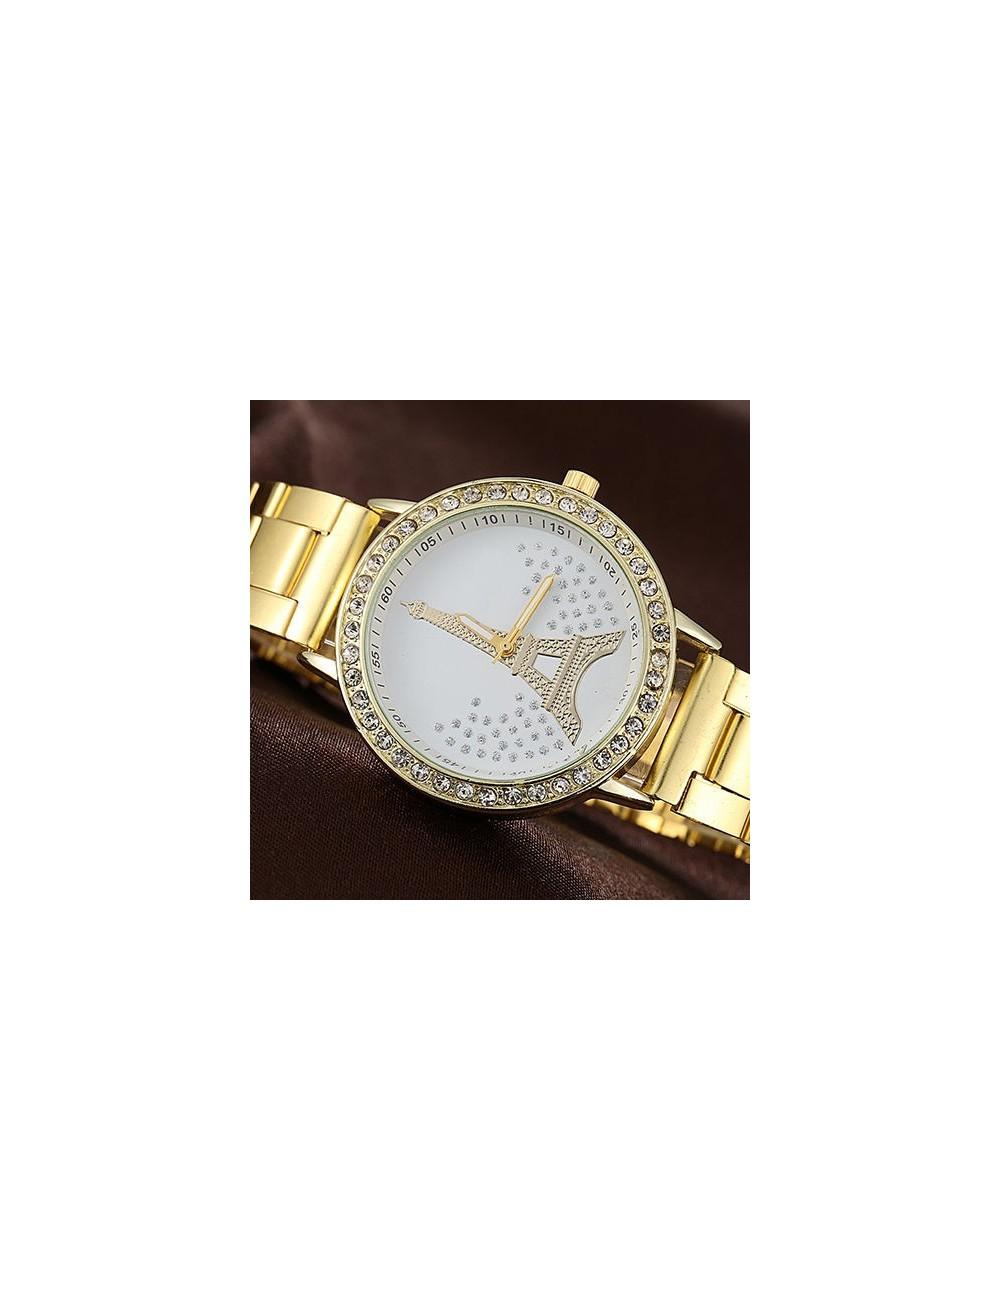 Reloj dorado Torre Eiffel